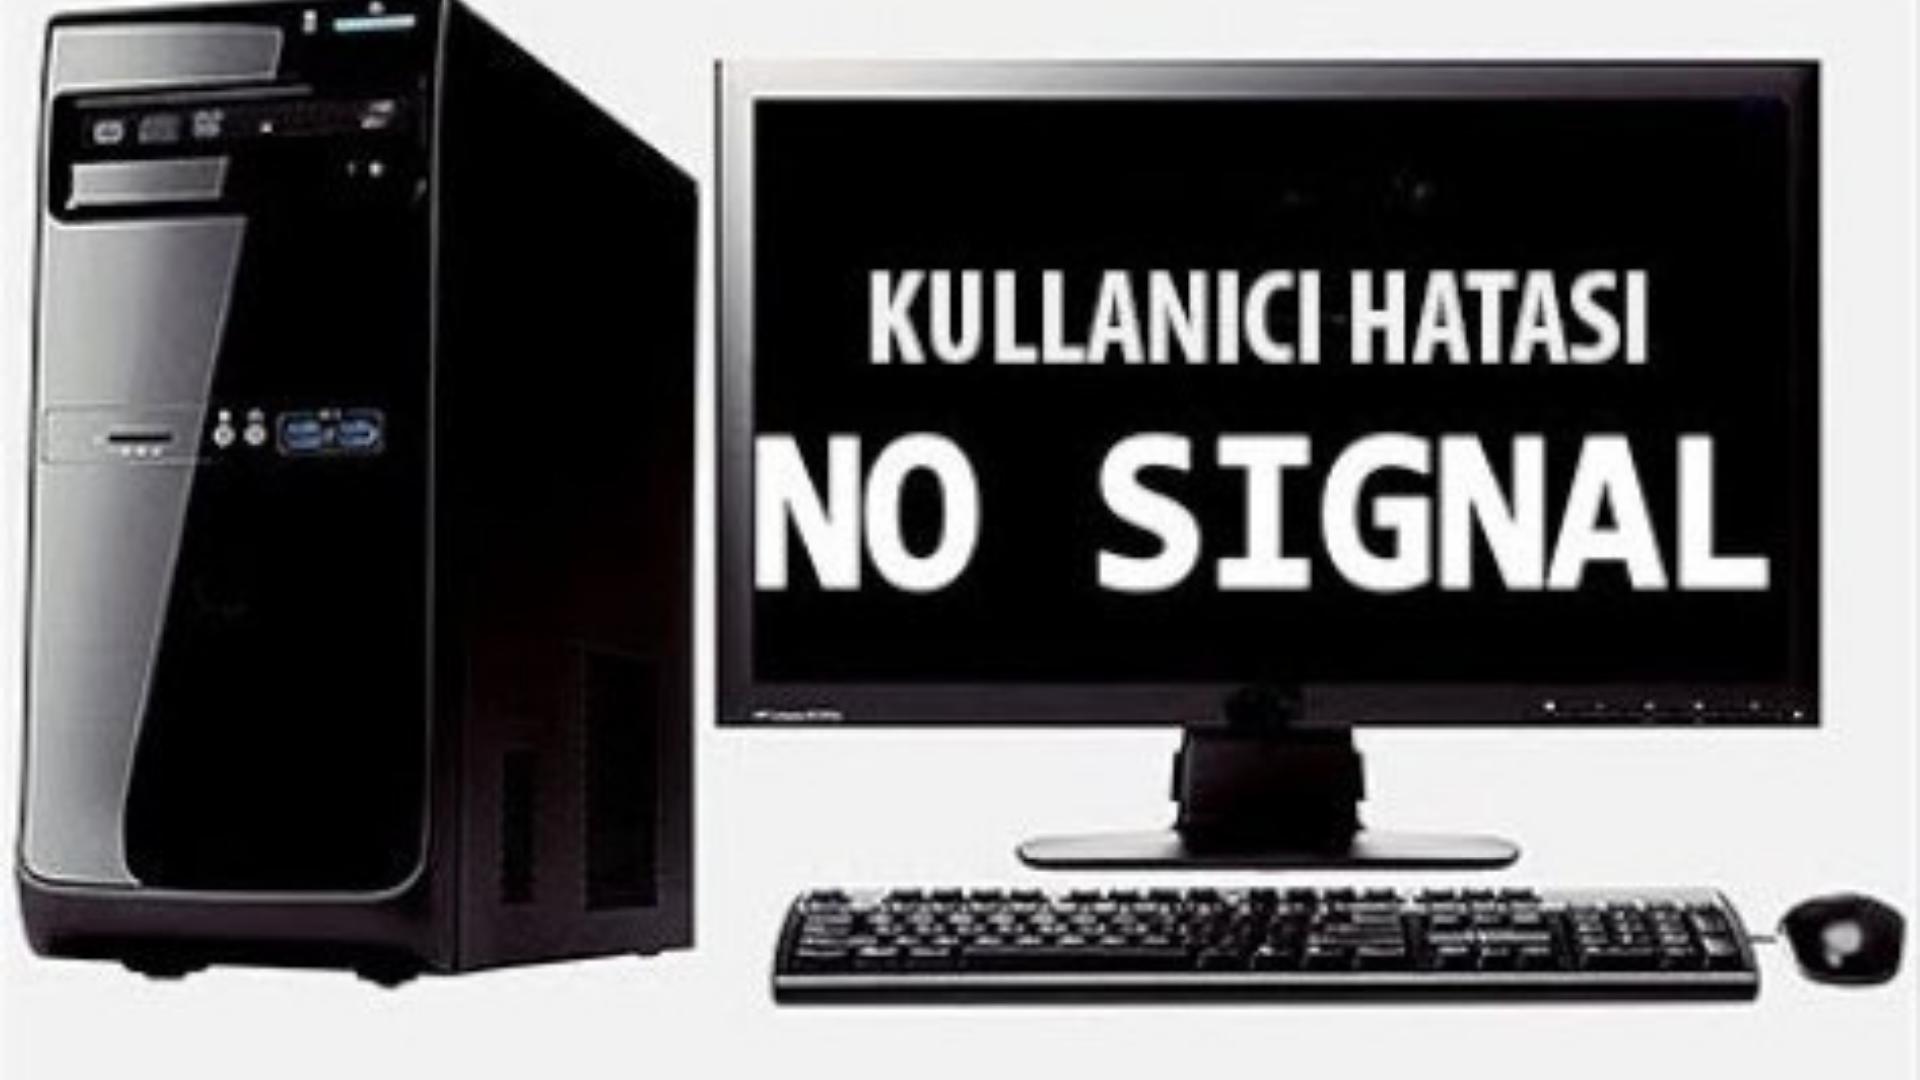 No Signal Hatası